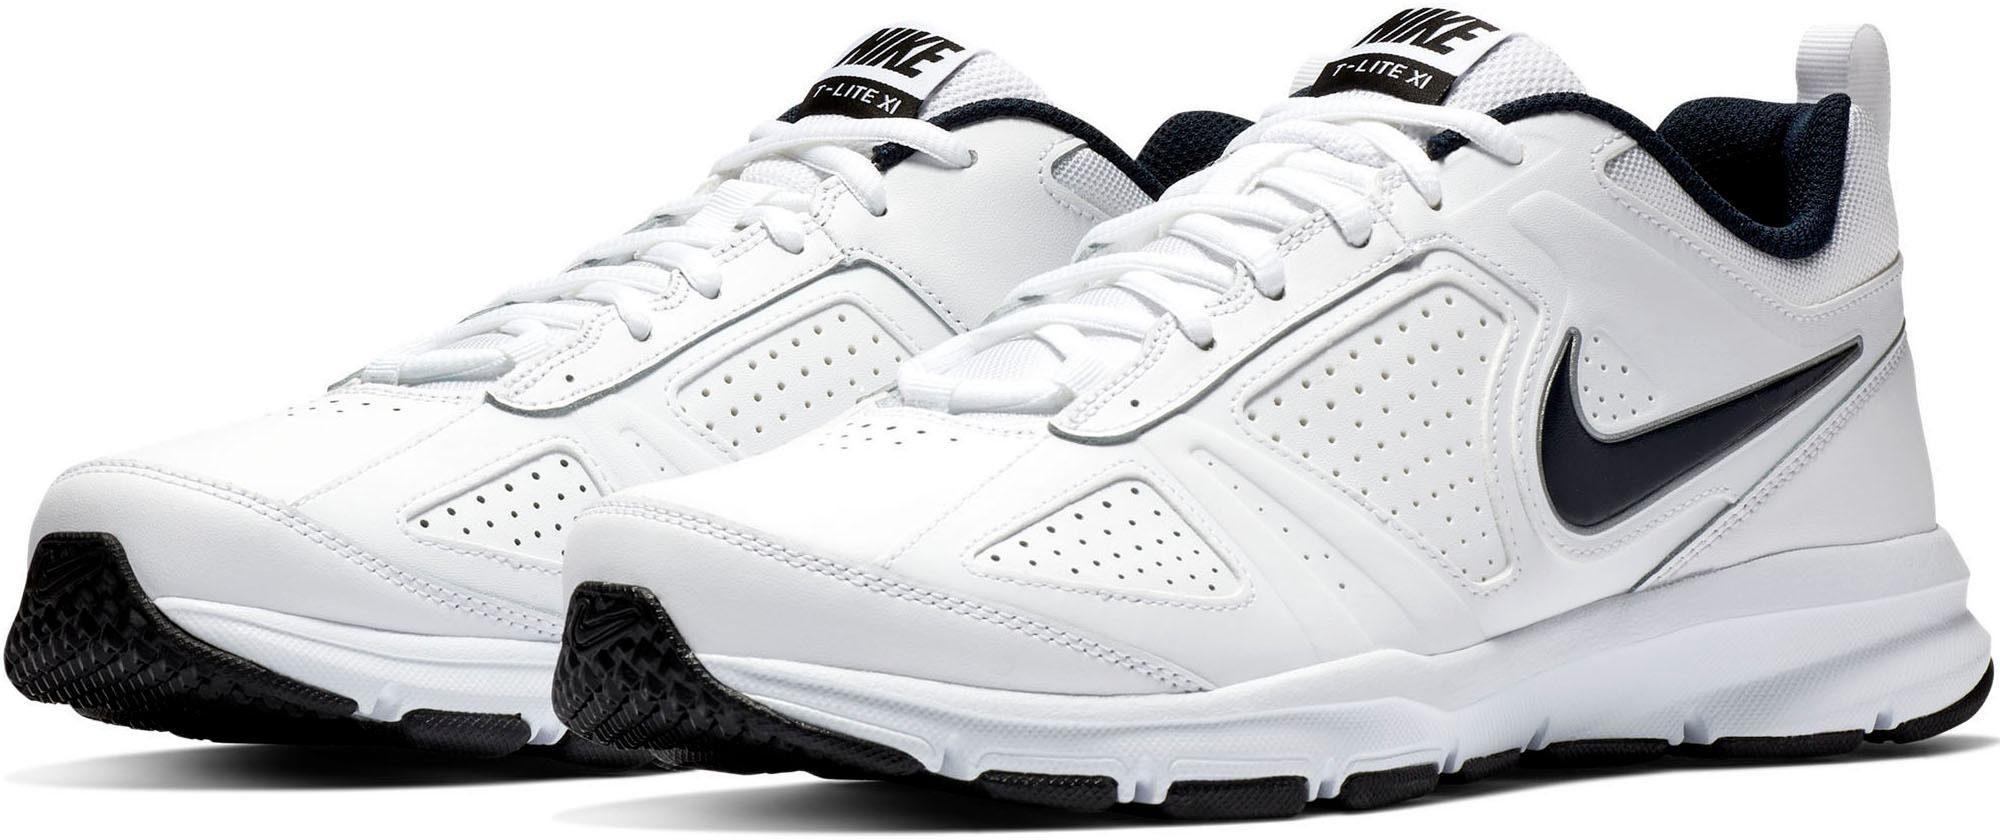 Nike »T-Lite XI« Walkingschuh online kaufen | OTTO